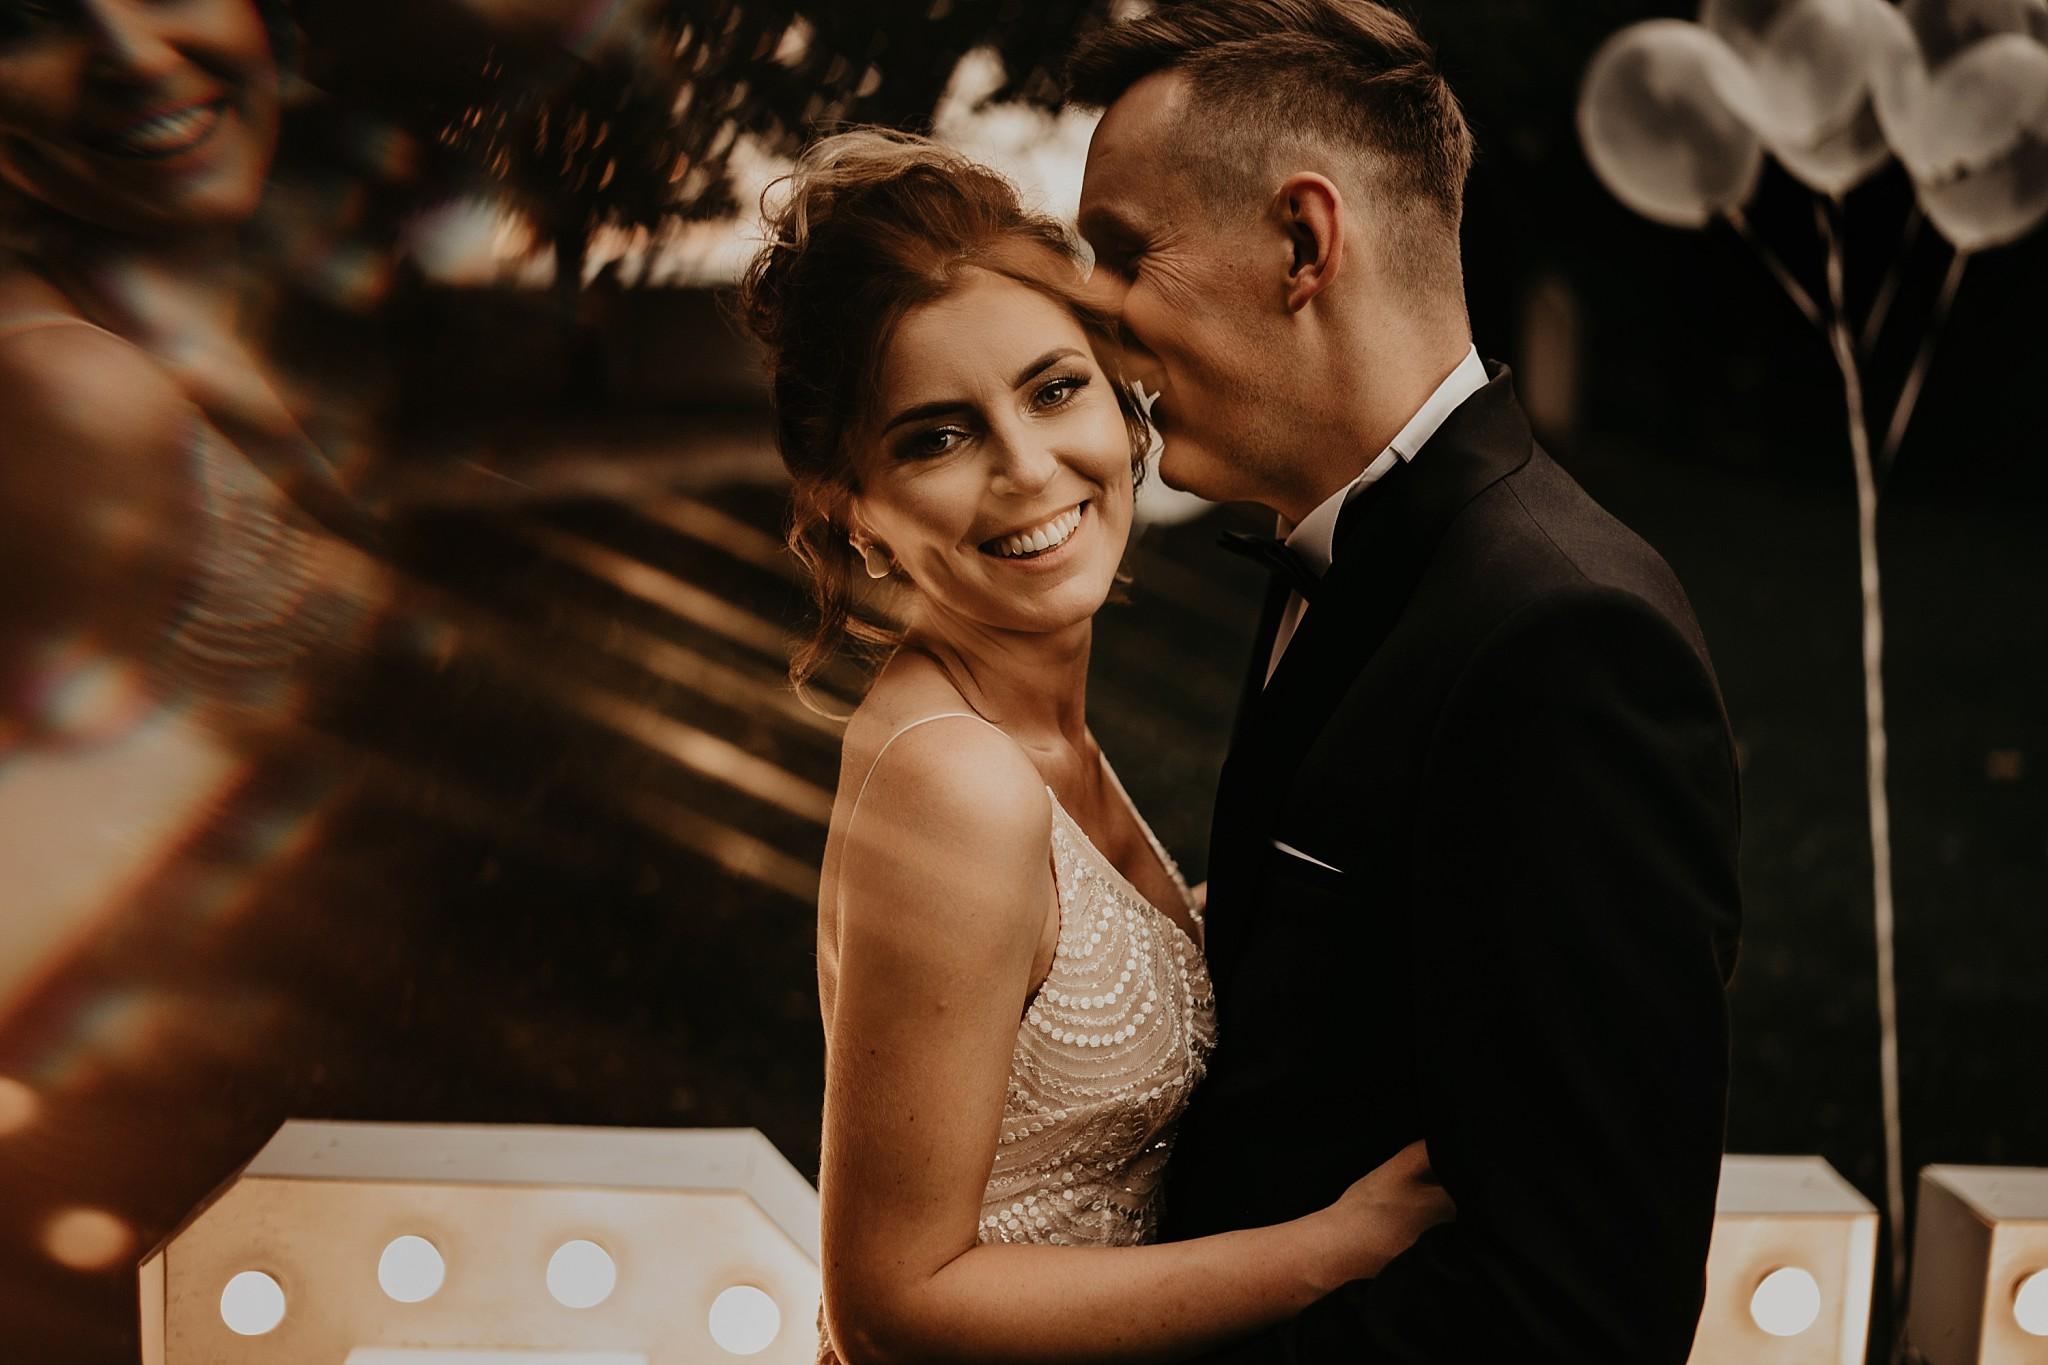 fotograf poznan wesele dobra truskawka piekne wesele pod poznaniem wesele w dobrej truskawce piekna para mloda slub marzen slub koronawirus slub listopad wesele koronawirus 348 1